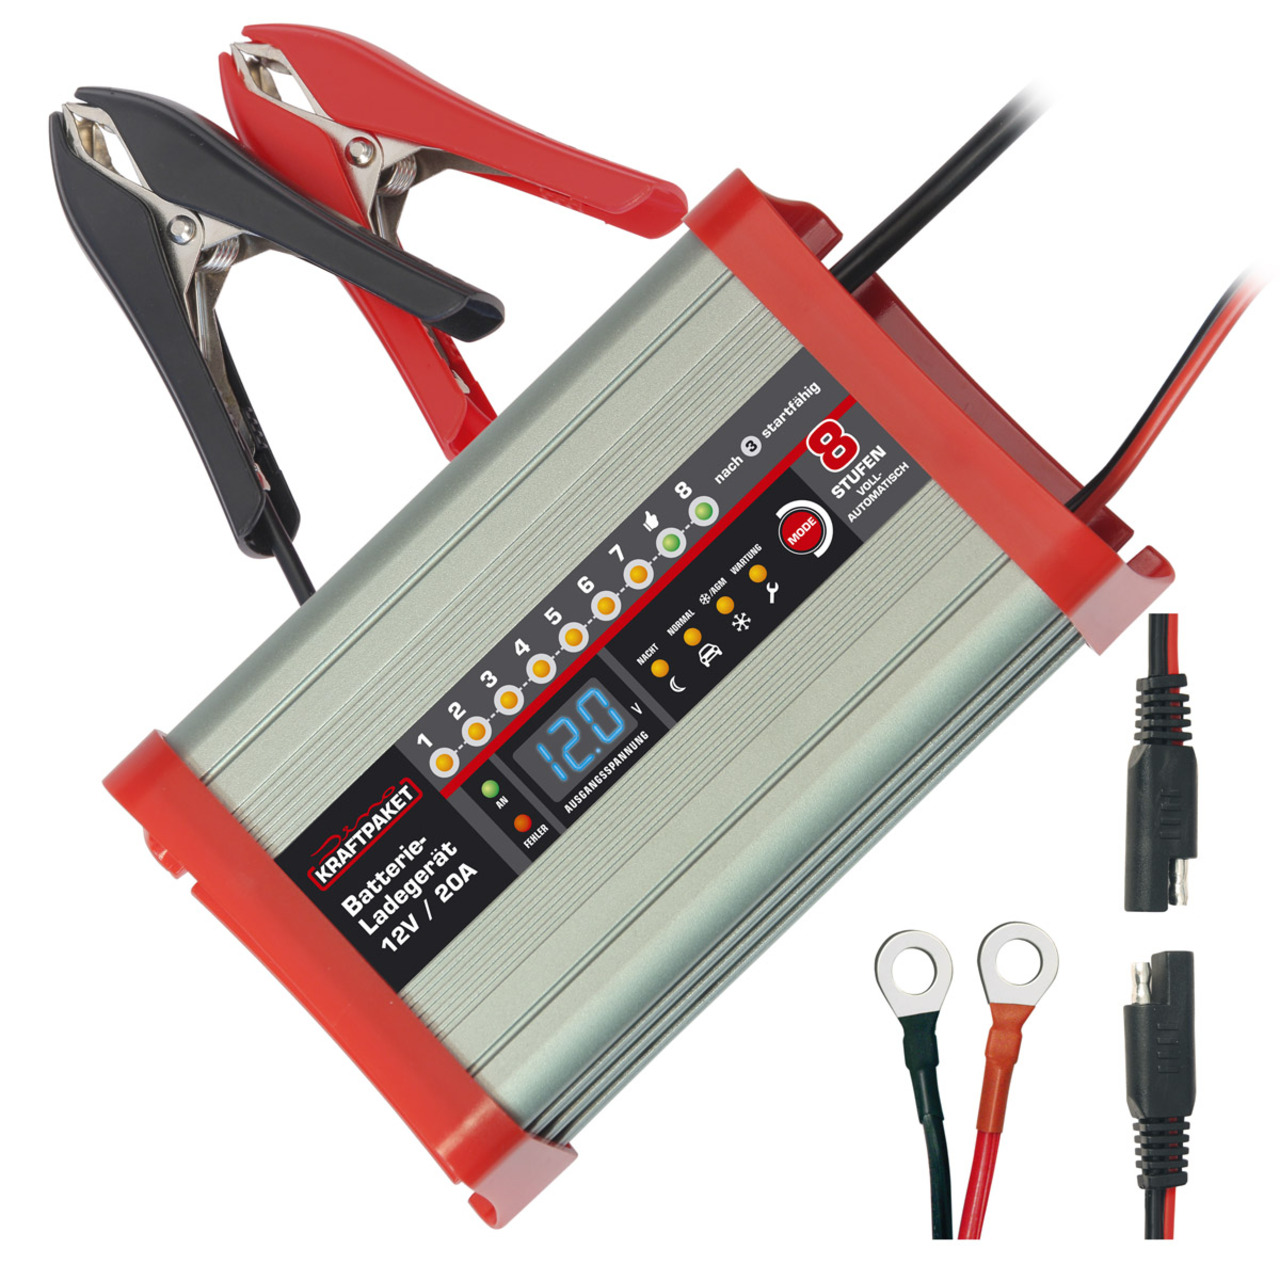 Dino KRAFTPAKET Kfz-Batterieladegerät- für 12-V-Batterien- 20 A-  Nacht- und Camping-Funktion